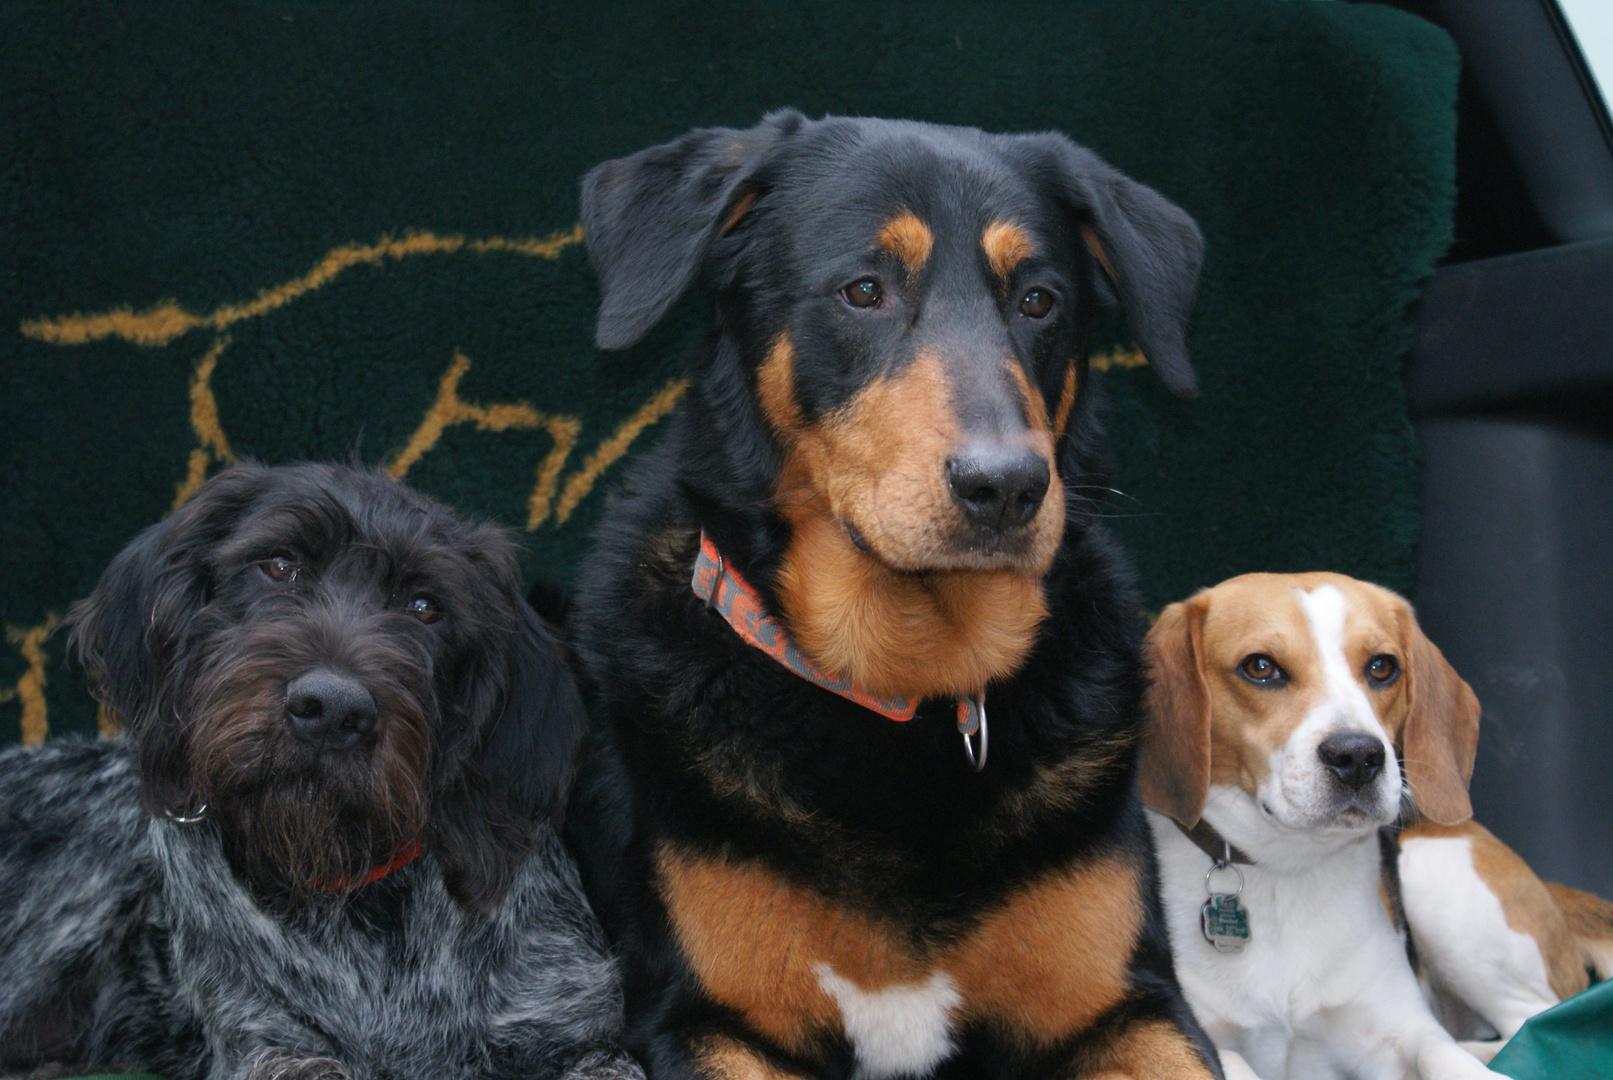 Paco & Friends